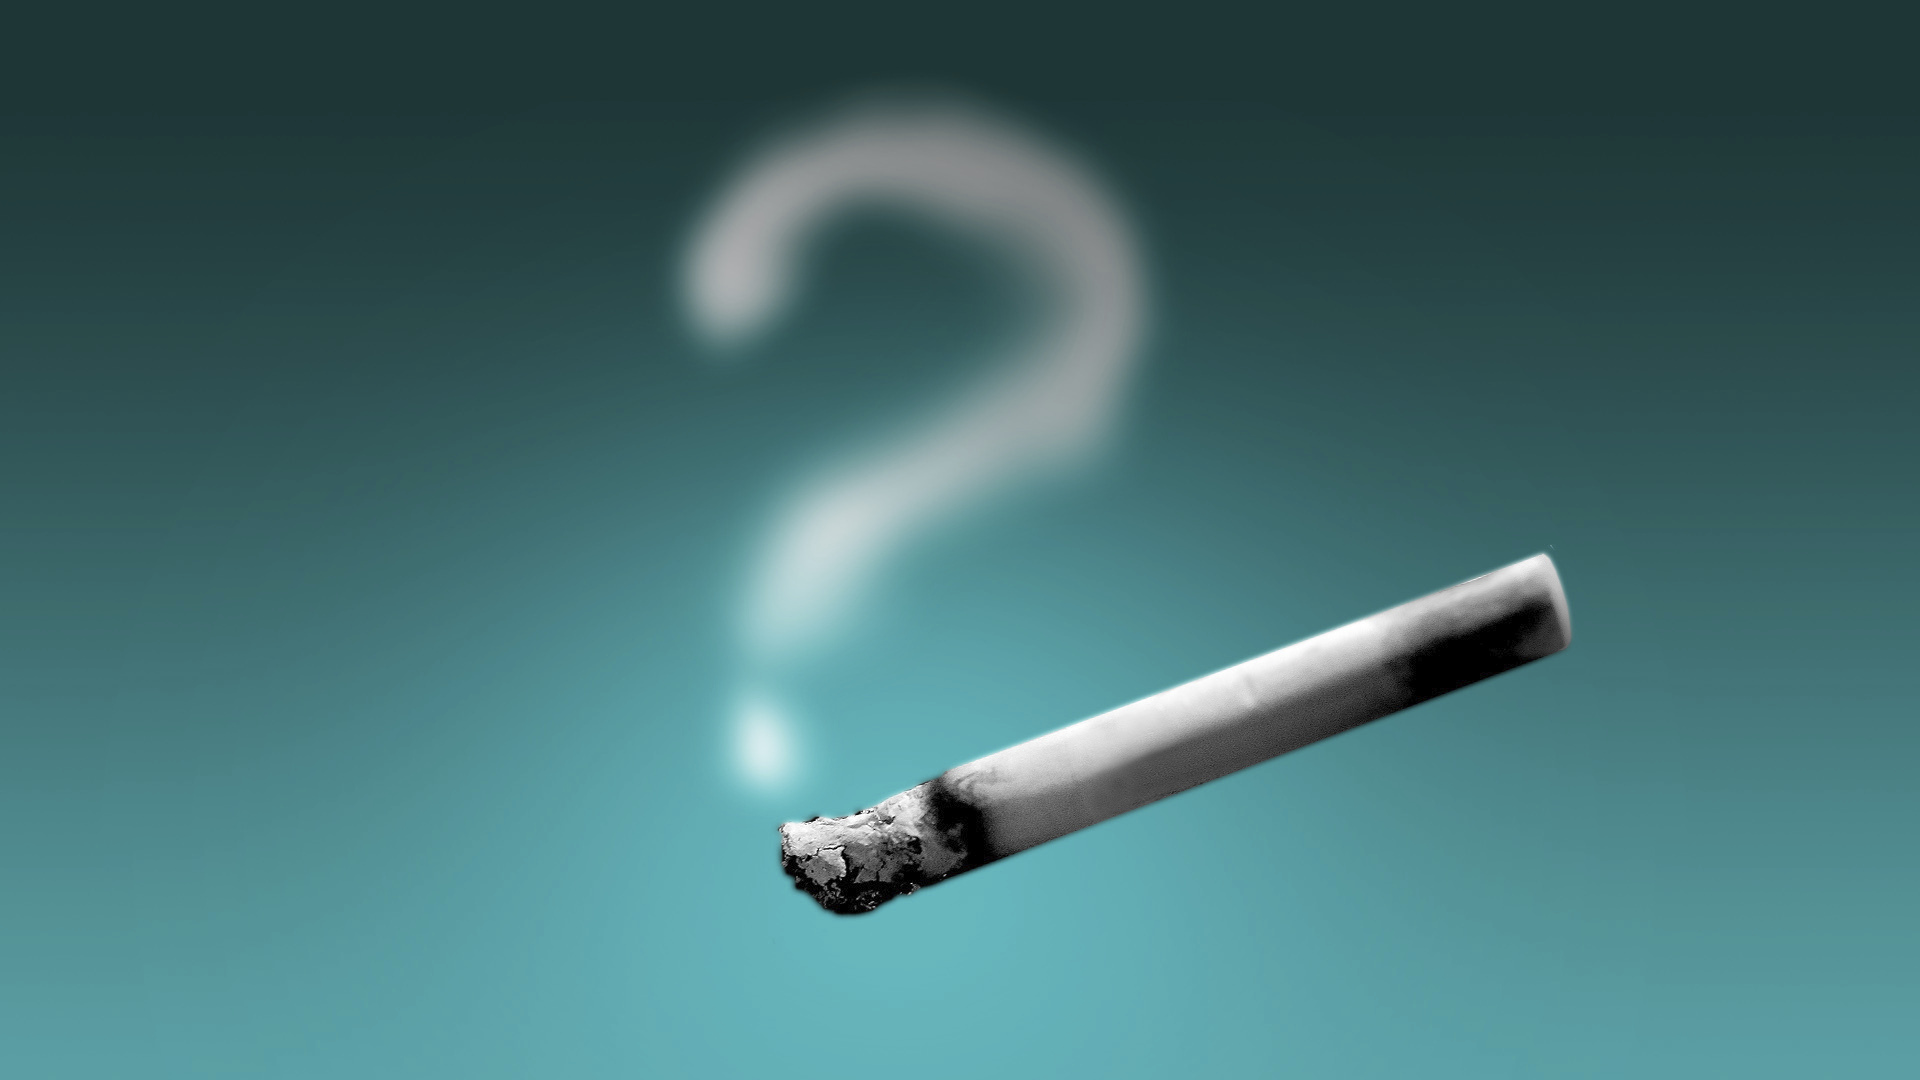 VIRUS OUTBREAK VIRAL QUESTIONS SMOKE